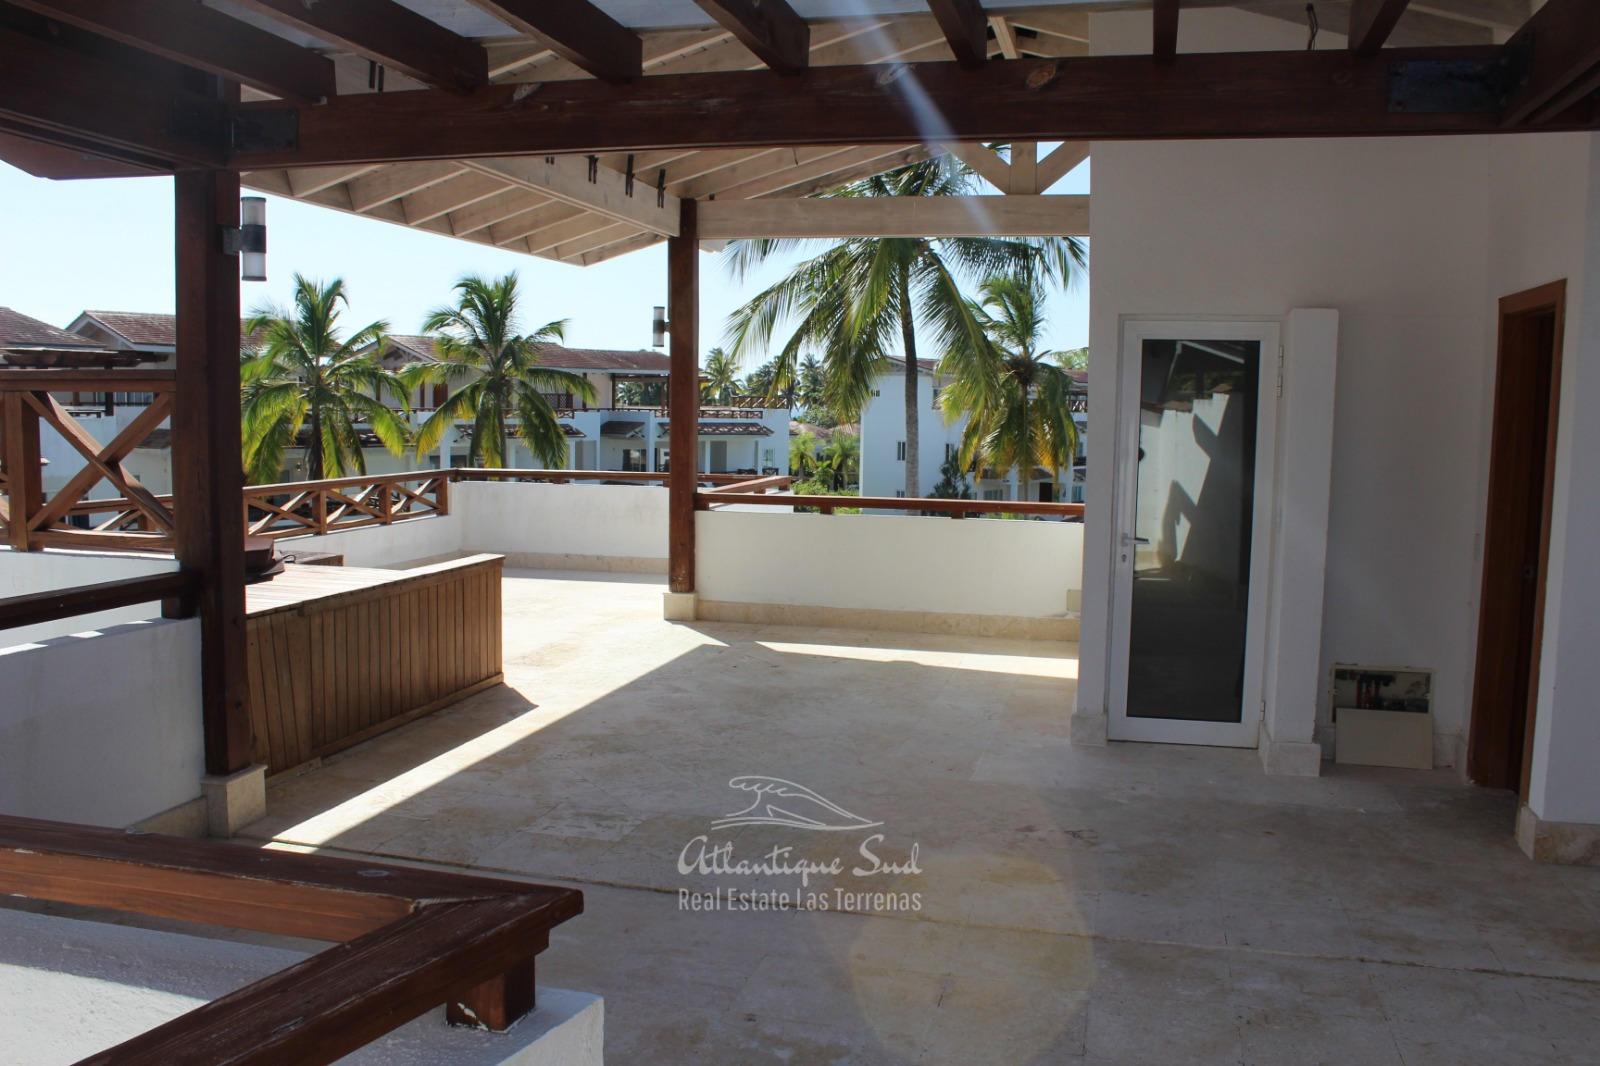 Apartments near the beach real estate las terrenas dominican republic46.jpg